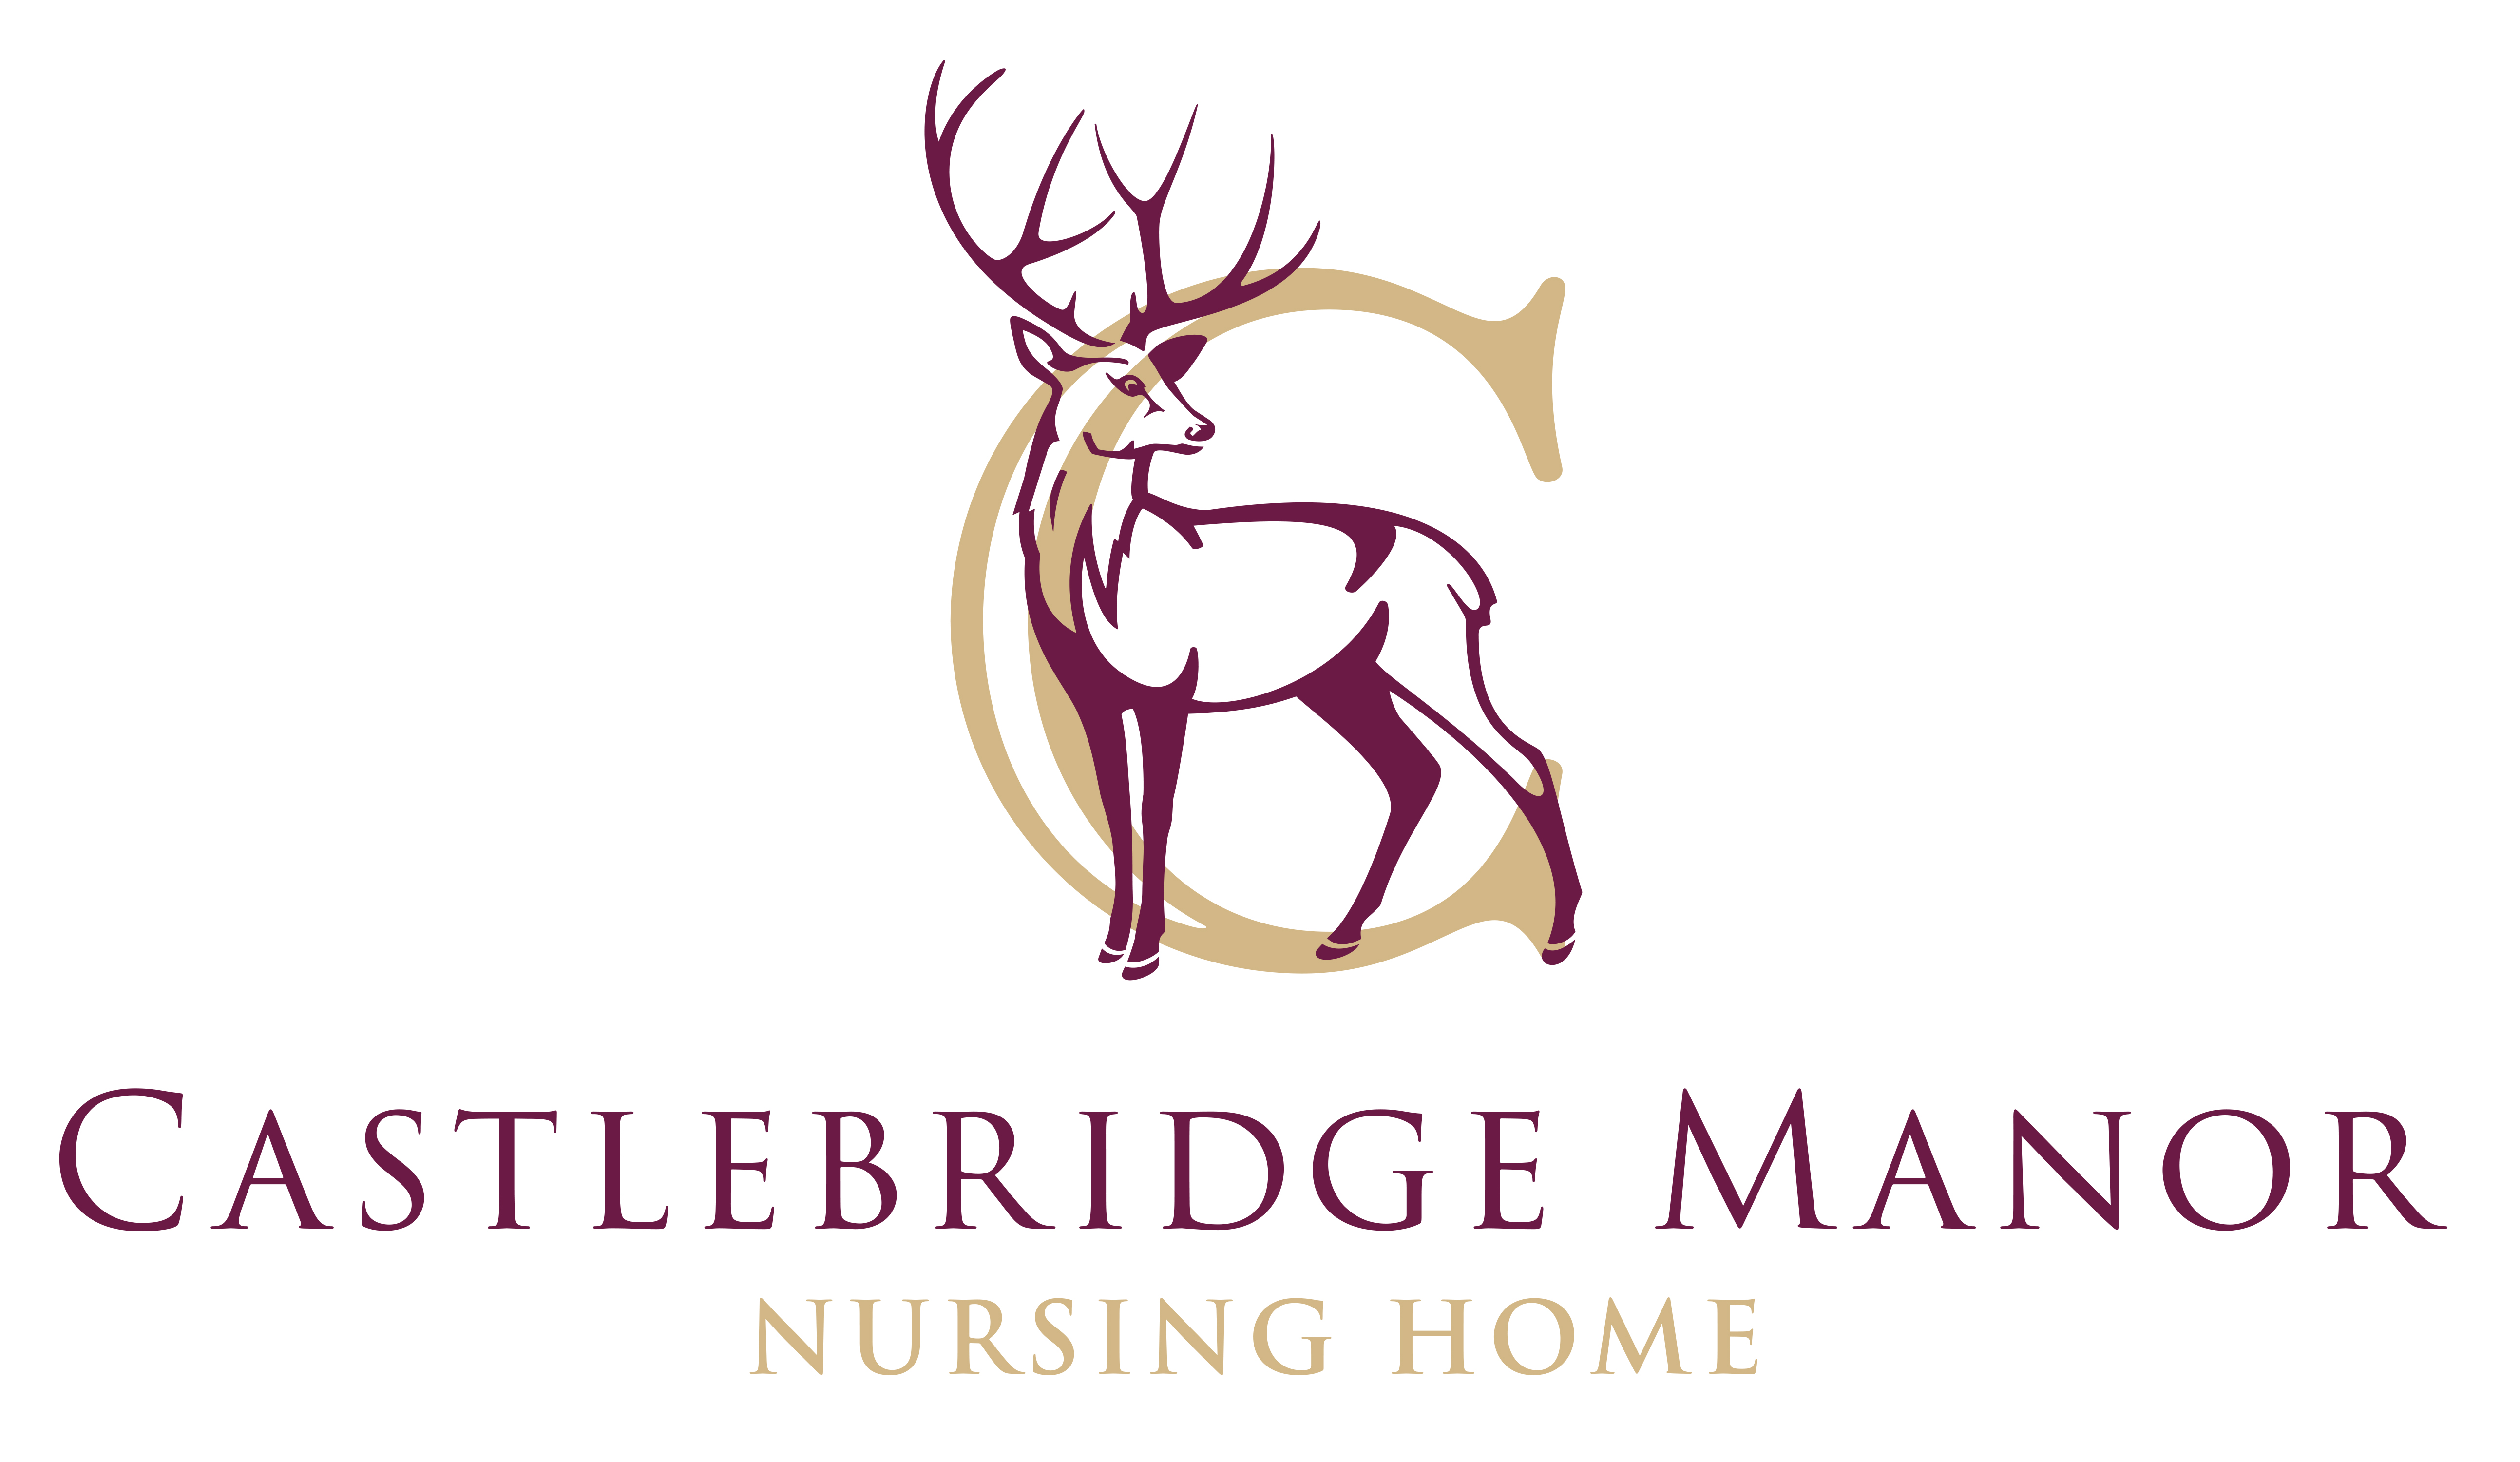 Castlebridge Manor Nursing Home